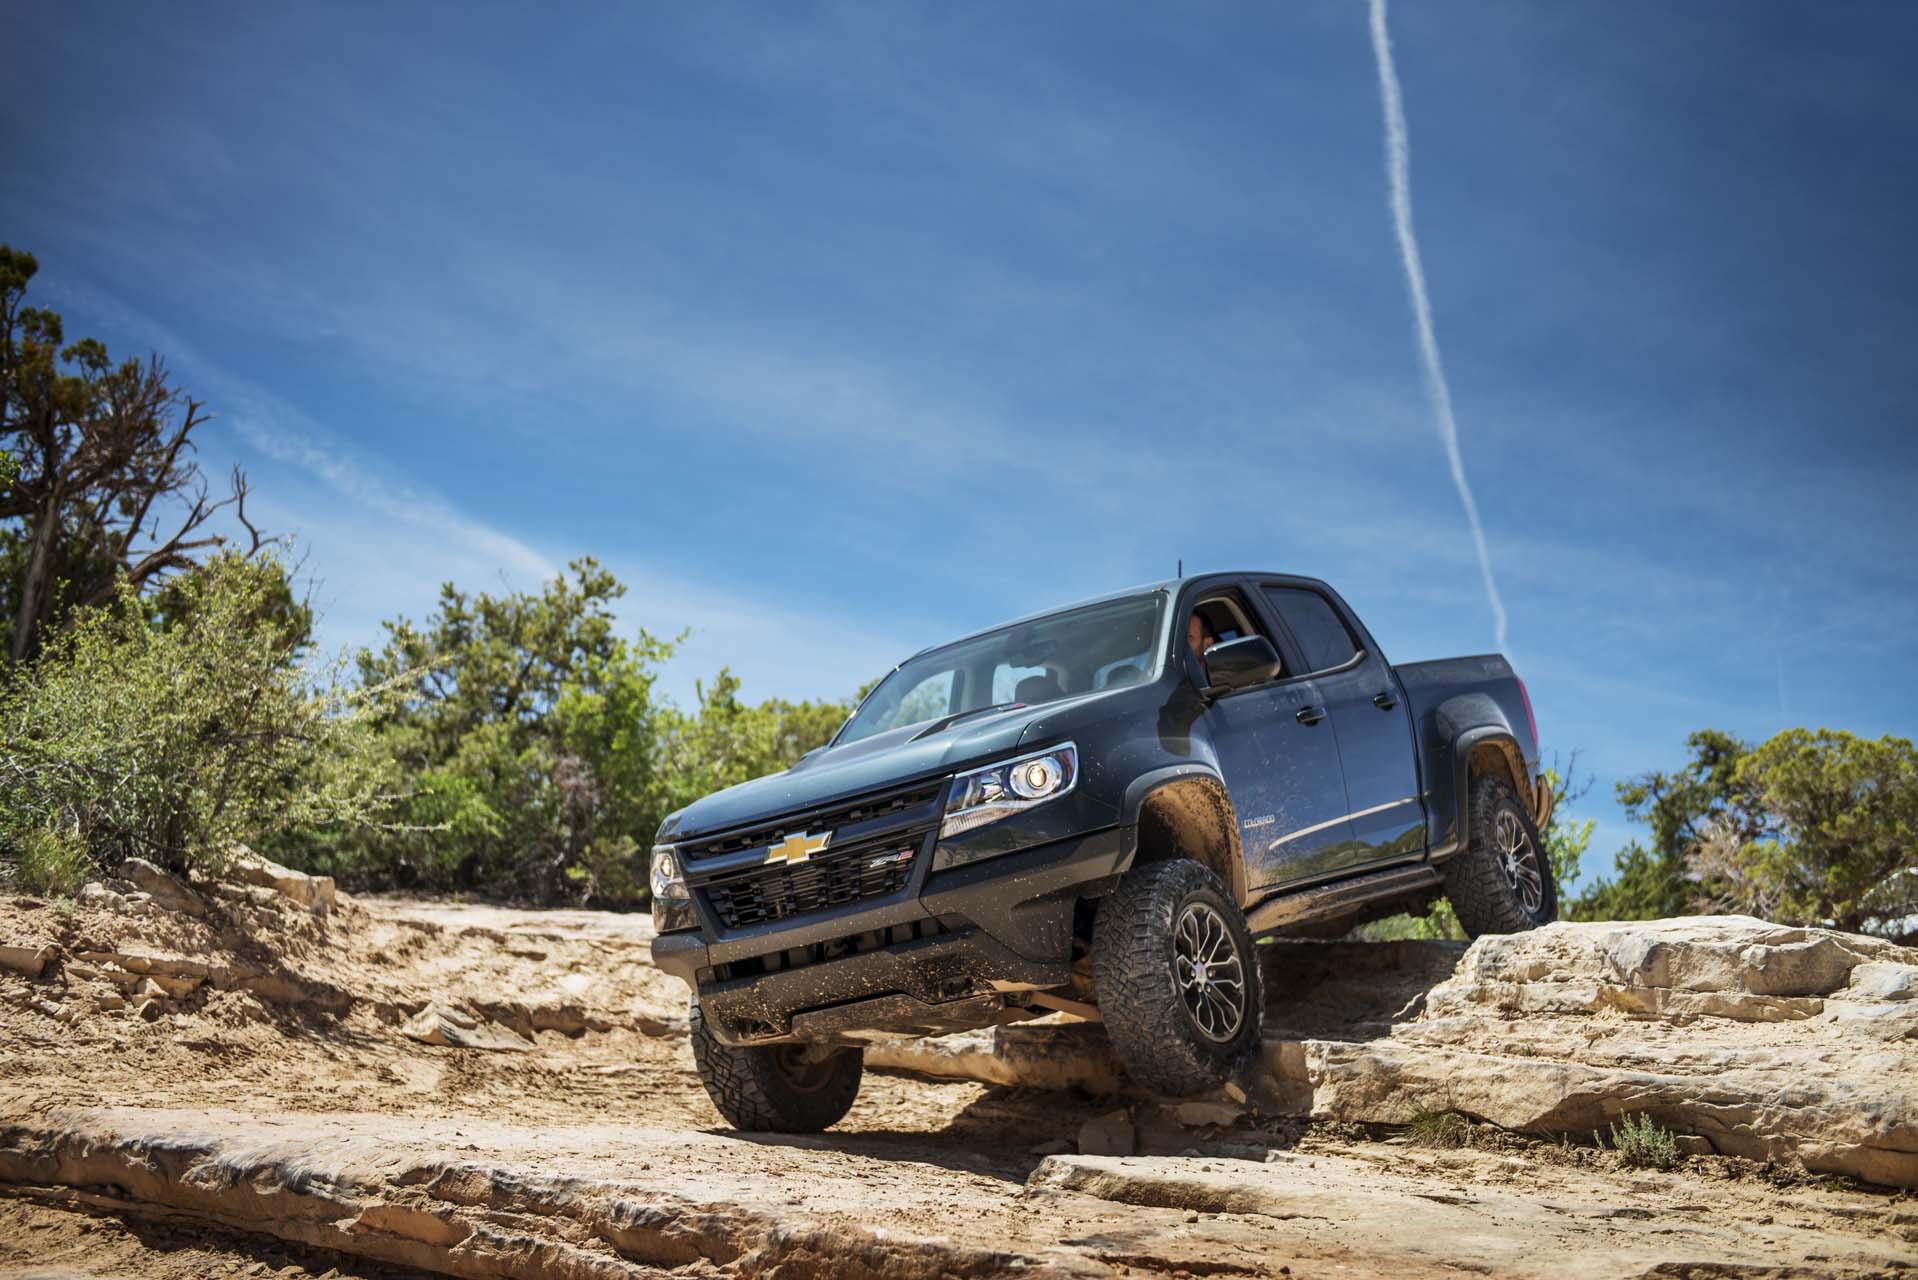 2017 Chevrolet Colorado Towing Capacity >> 2017 Chevrolet Colorado Chevy Review Ratings Specs